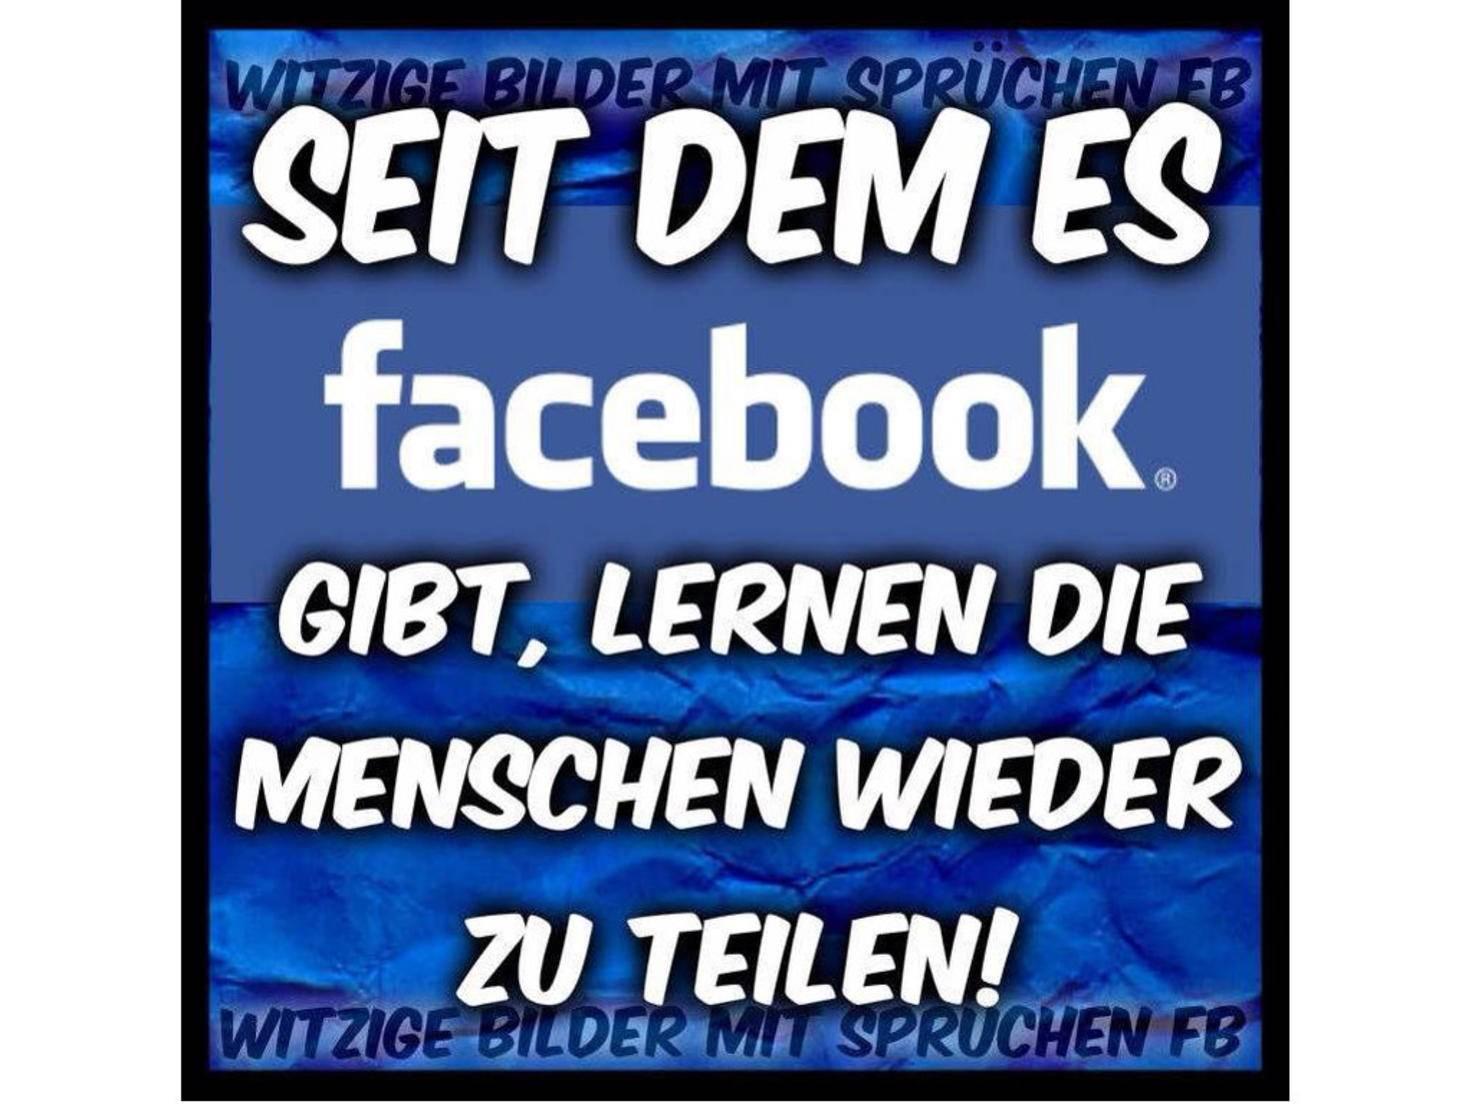 Coole Sprüche Facebook Status Kurze Zitate Status 2019 07 25